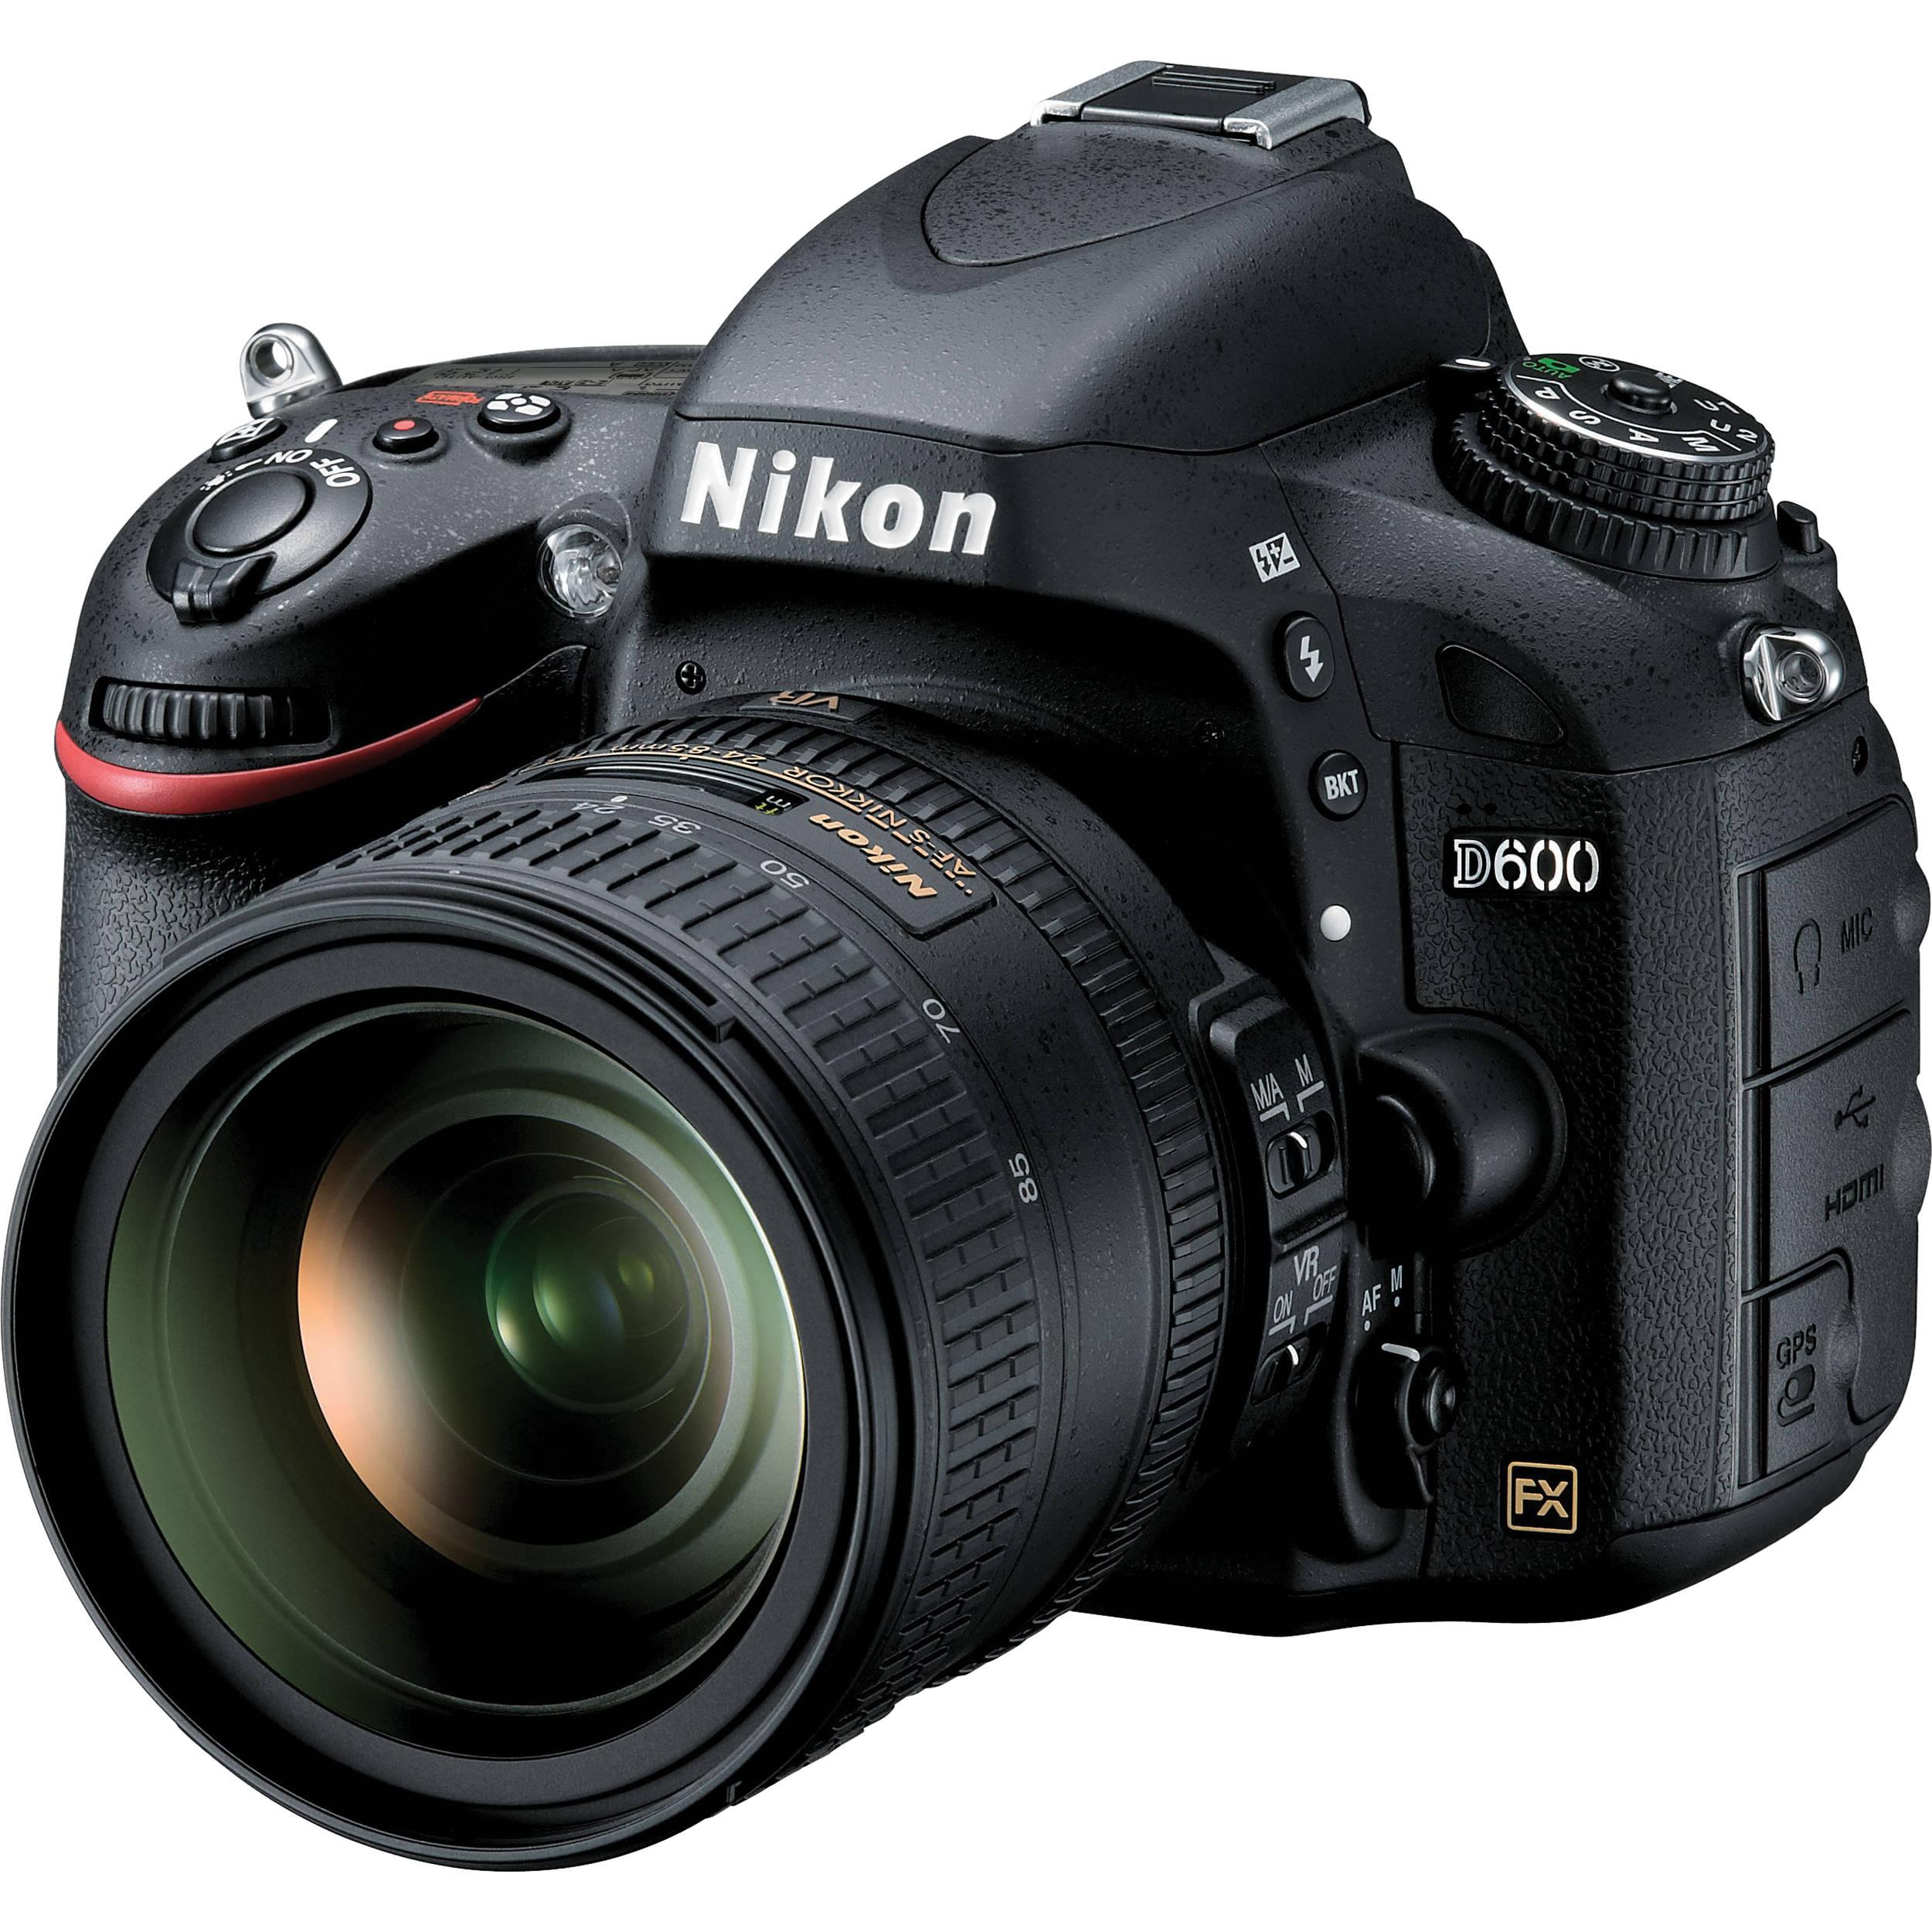 Perky Camera Nikon D3300 Refurbished India Nikon D3300 Refurbished Ebay Nikon Refurbished Nikon Lens dpreview Nikon D3300 Refurbished